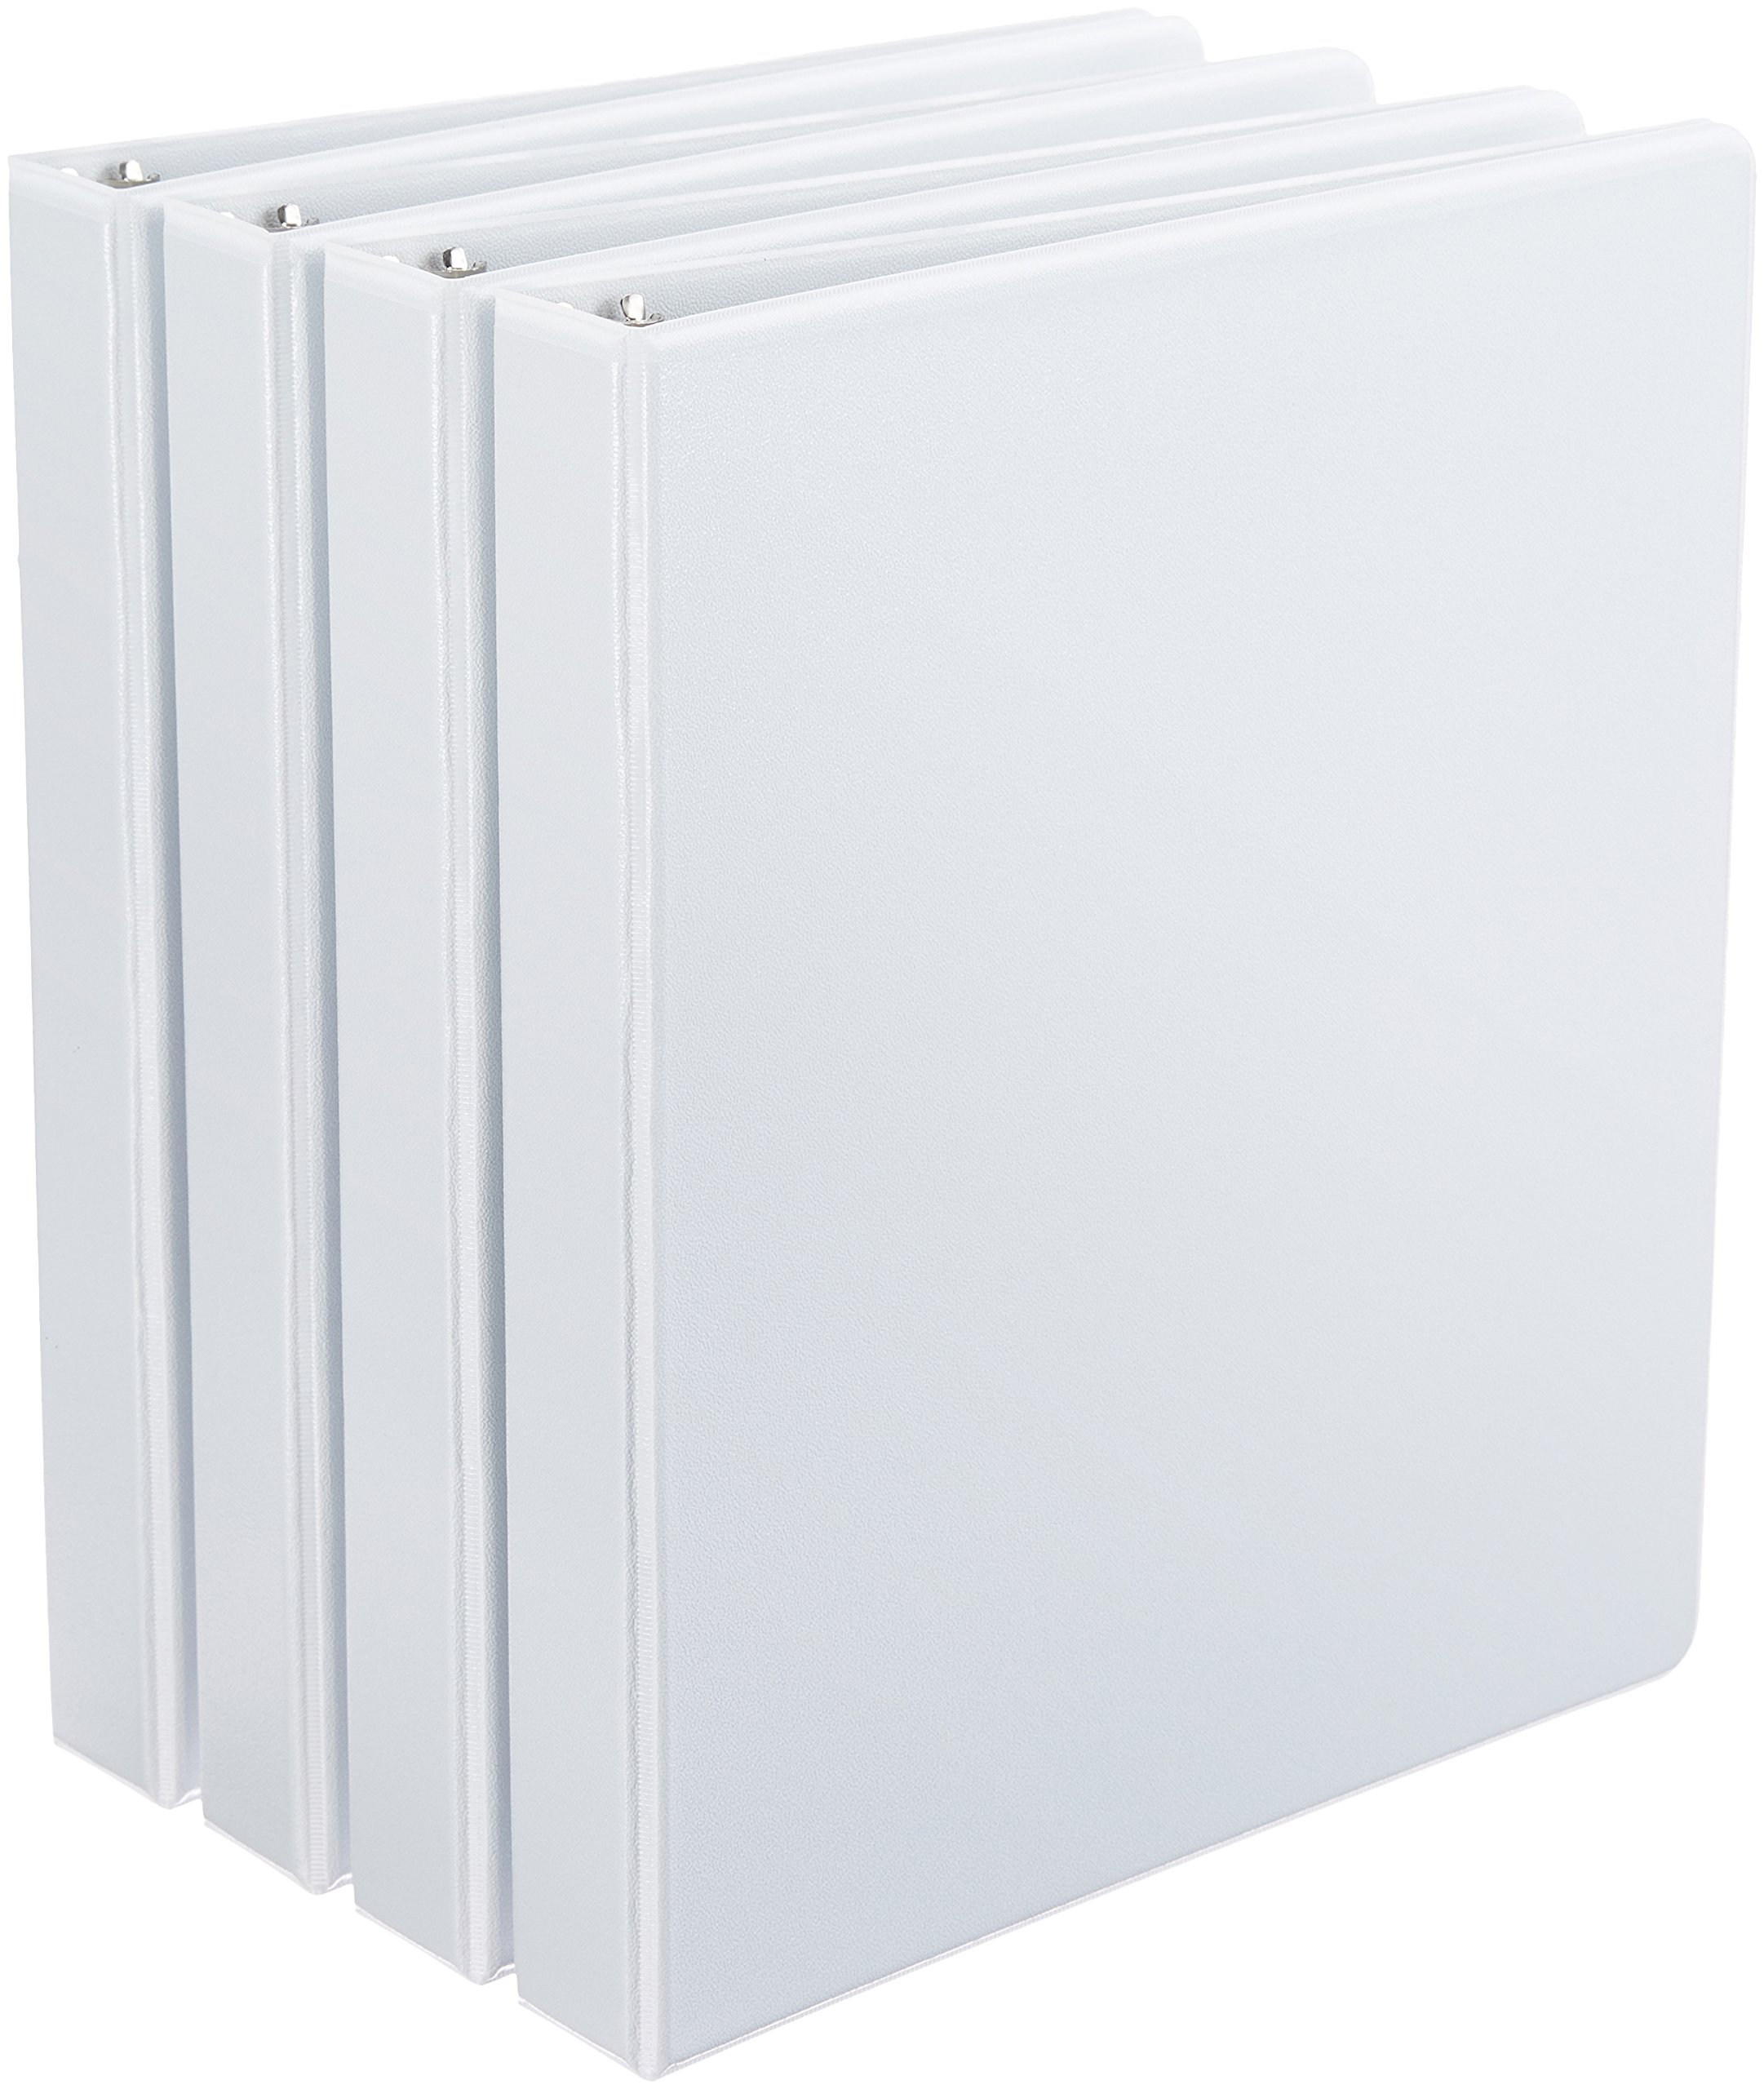 AmazonBasics D-Ring Binders - 1-Inch, 4-Pack